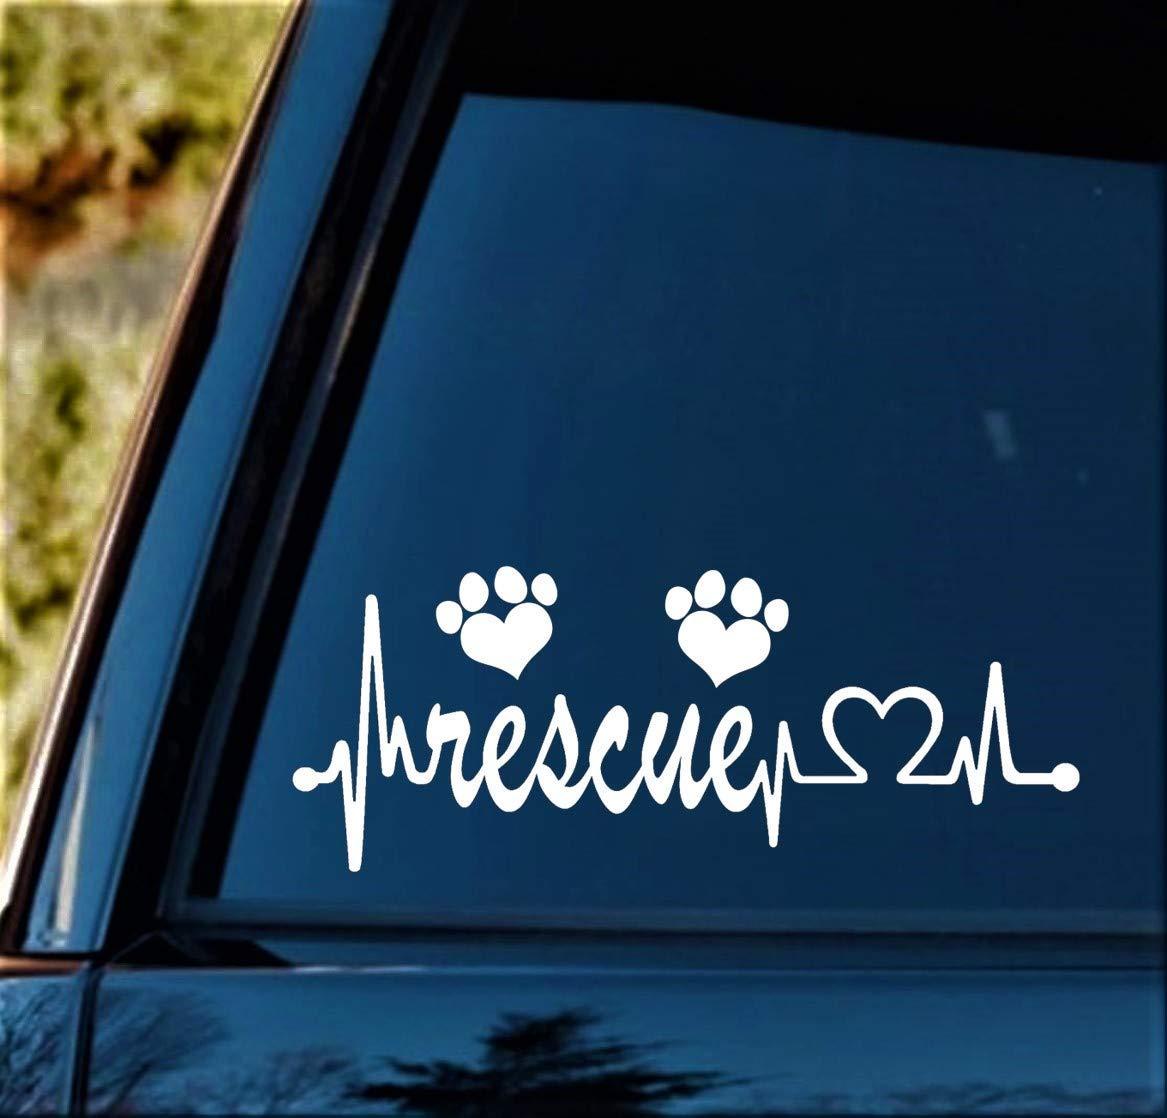 Animal Rescue Heartbeat Lifeline Decal Sticker for Car Window BG 117